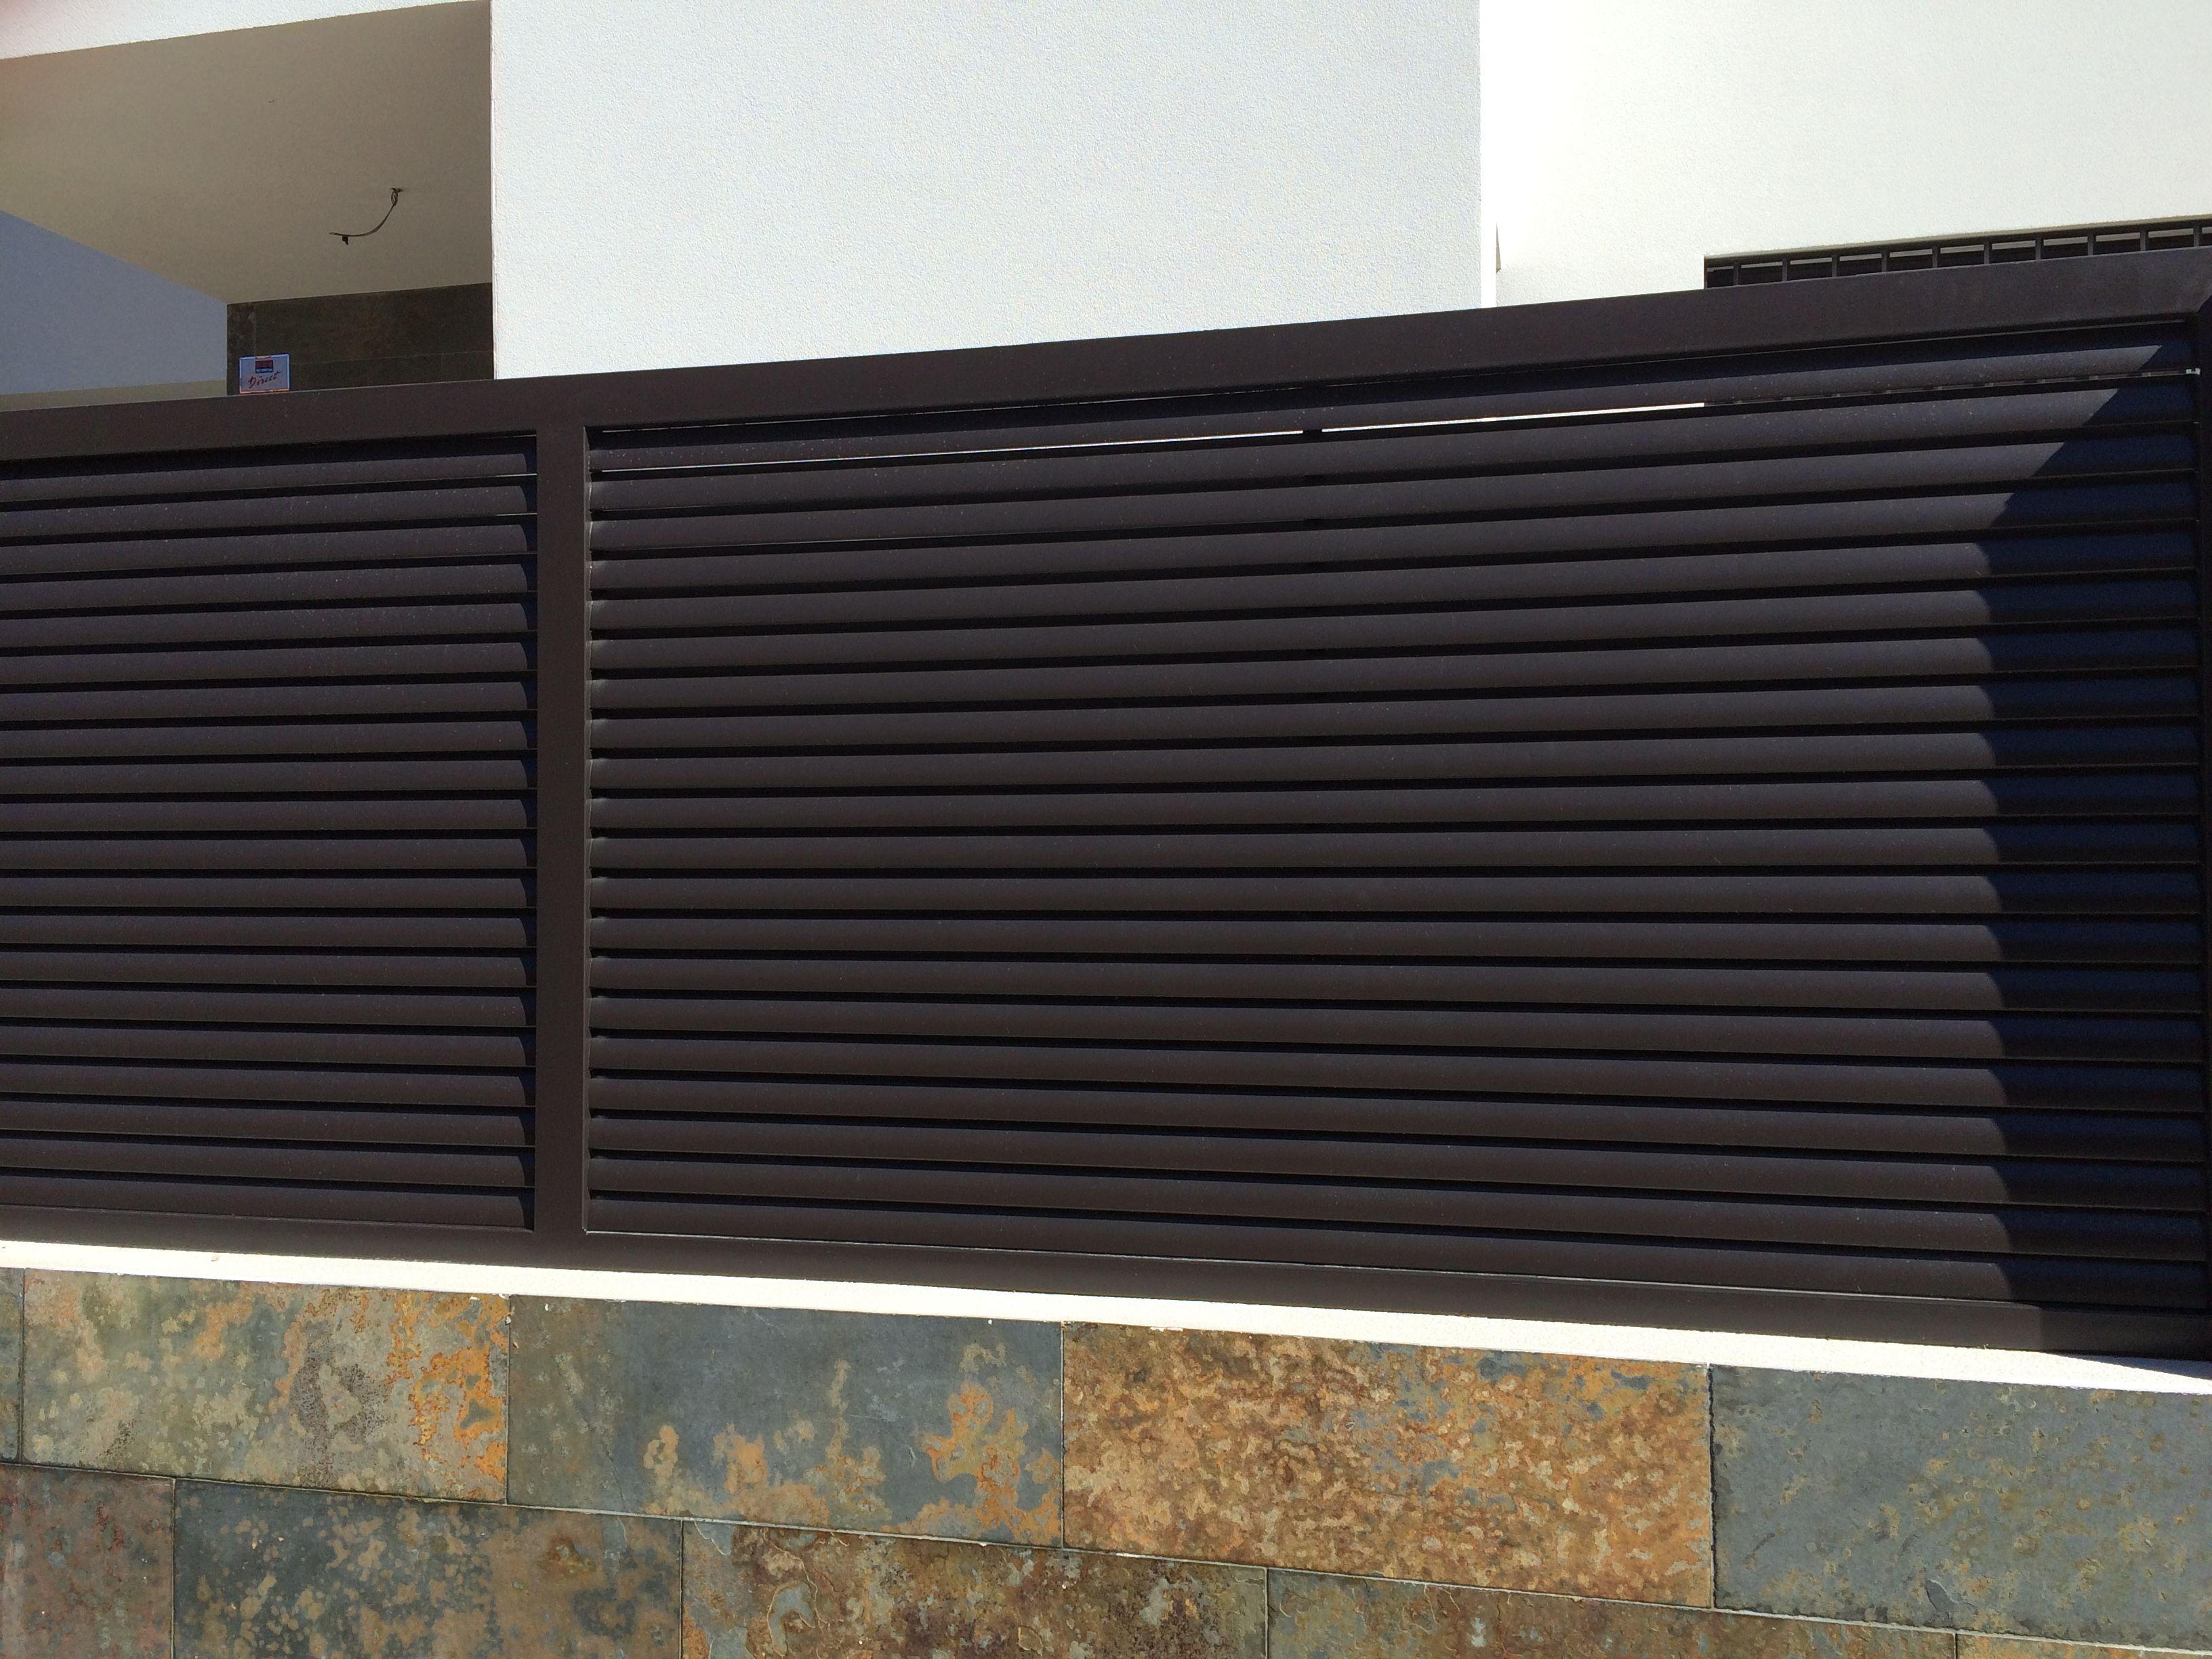 Celos a metalica moderna valla exterior metalica - Celosias de hierro ...